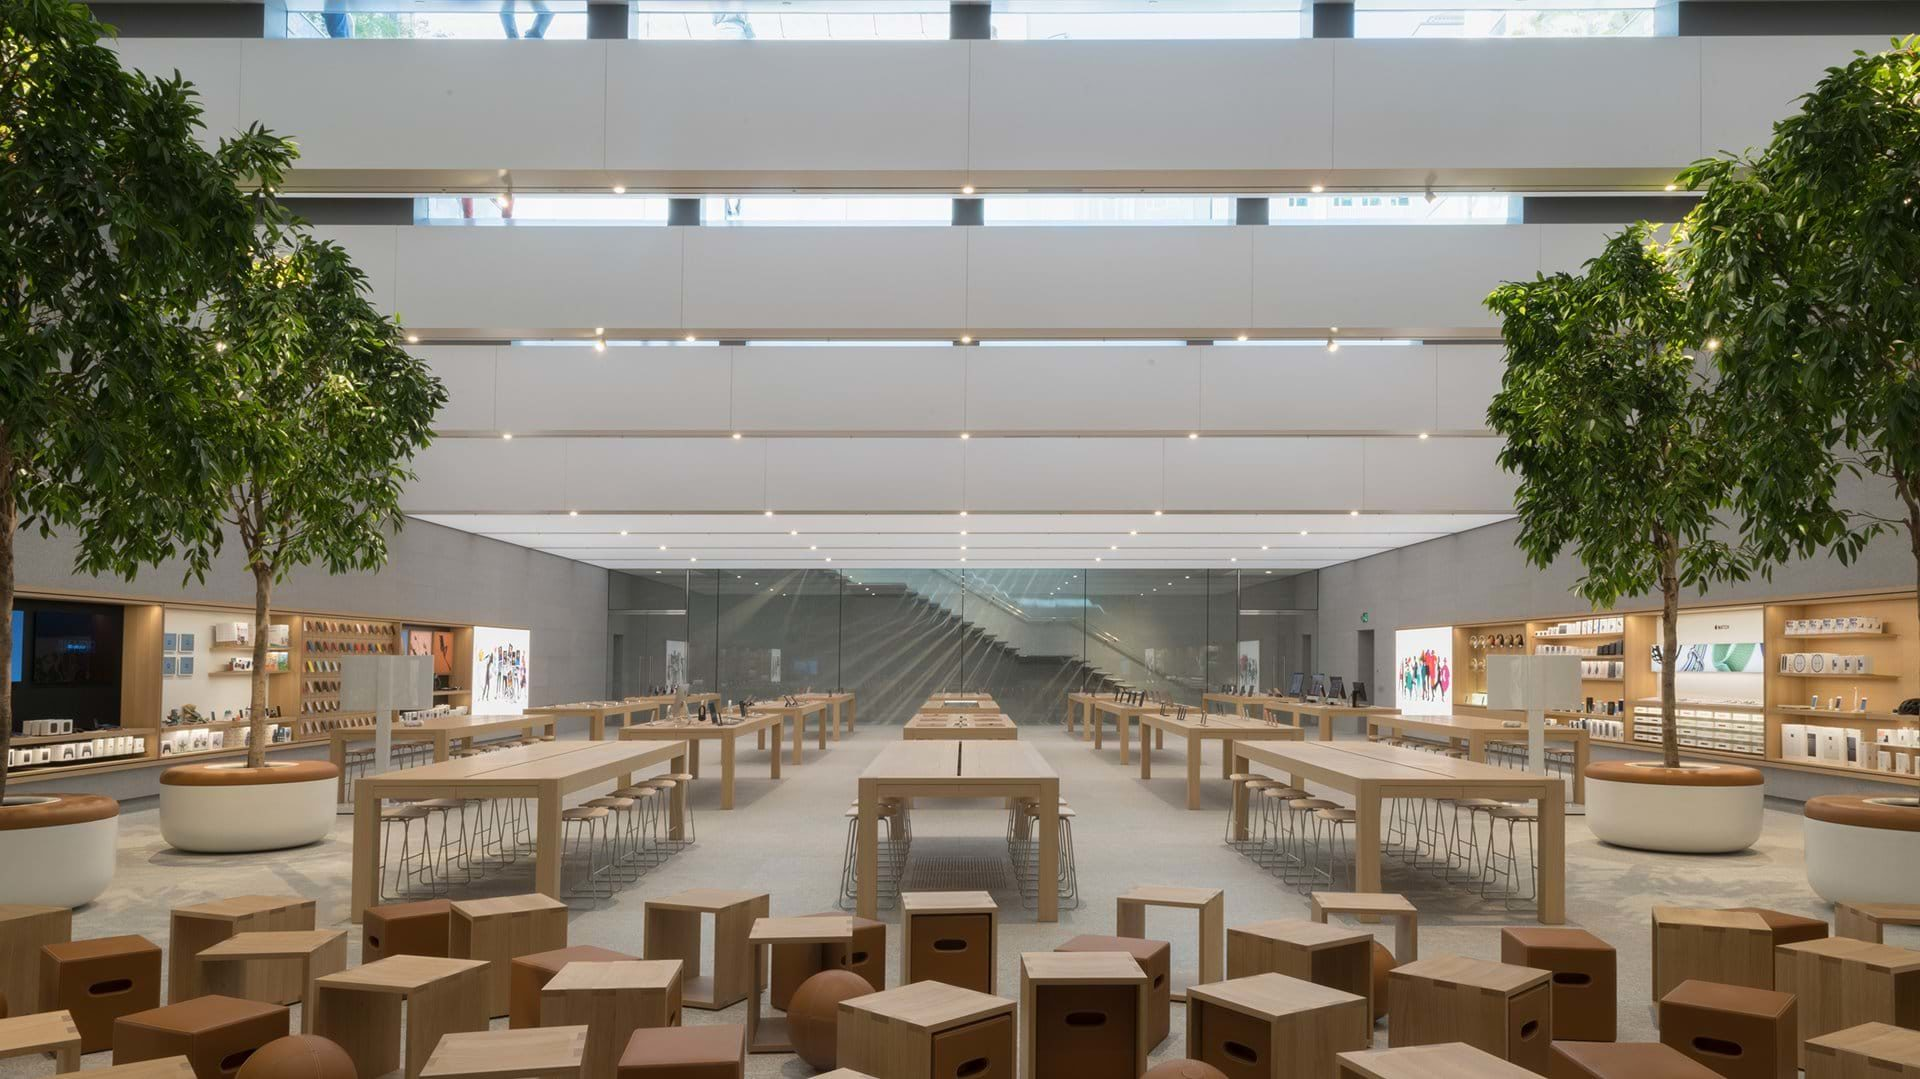 apple strore milan internal main room